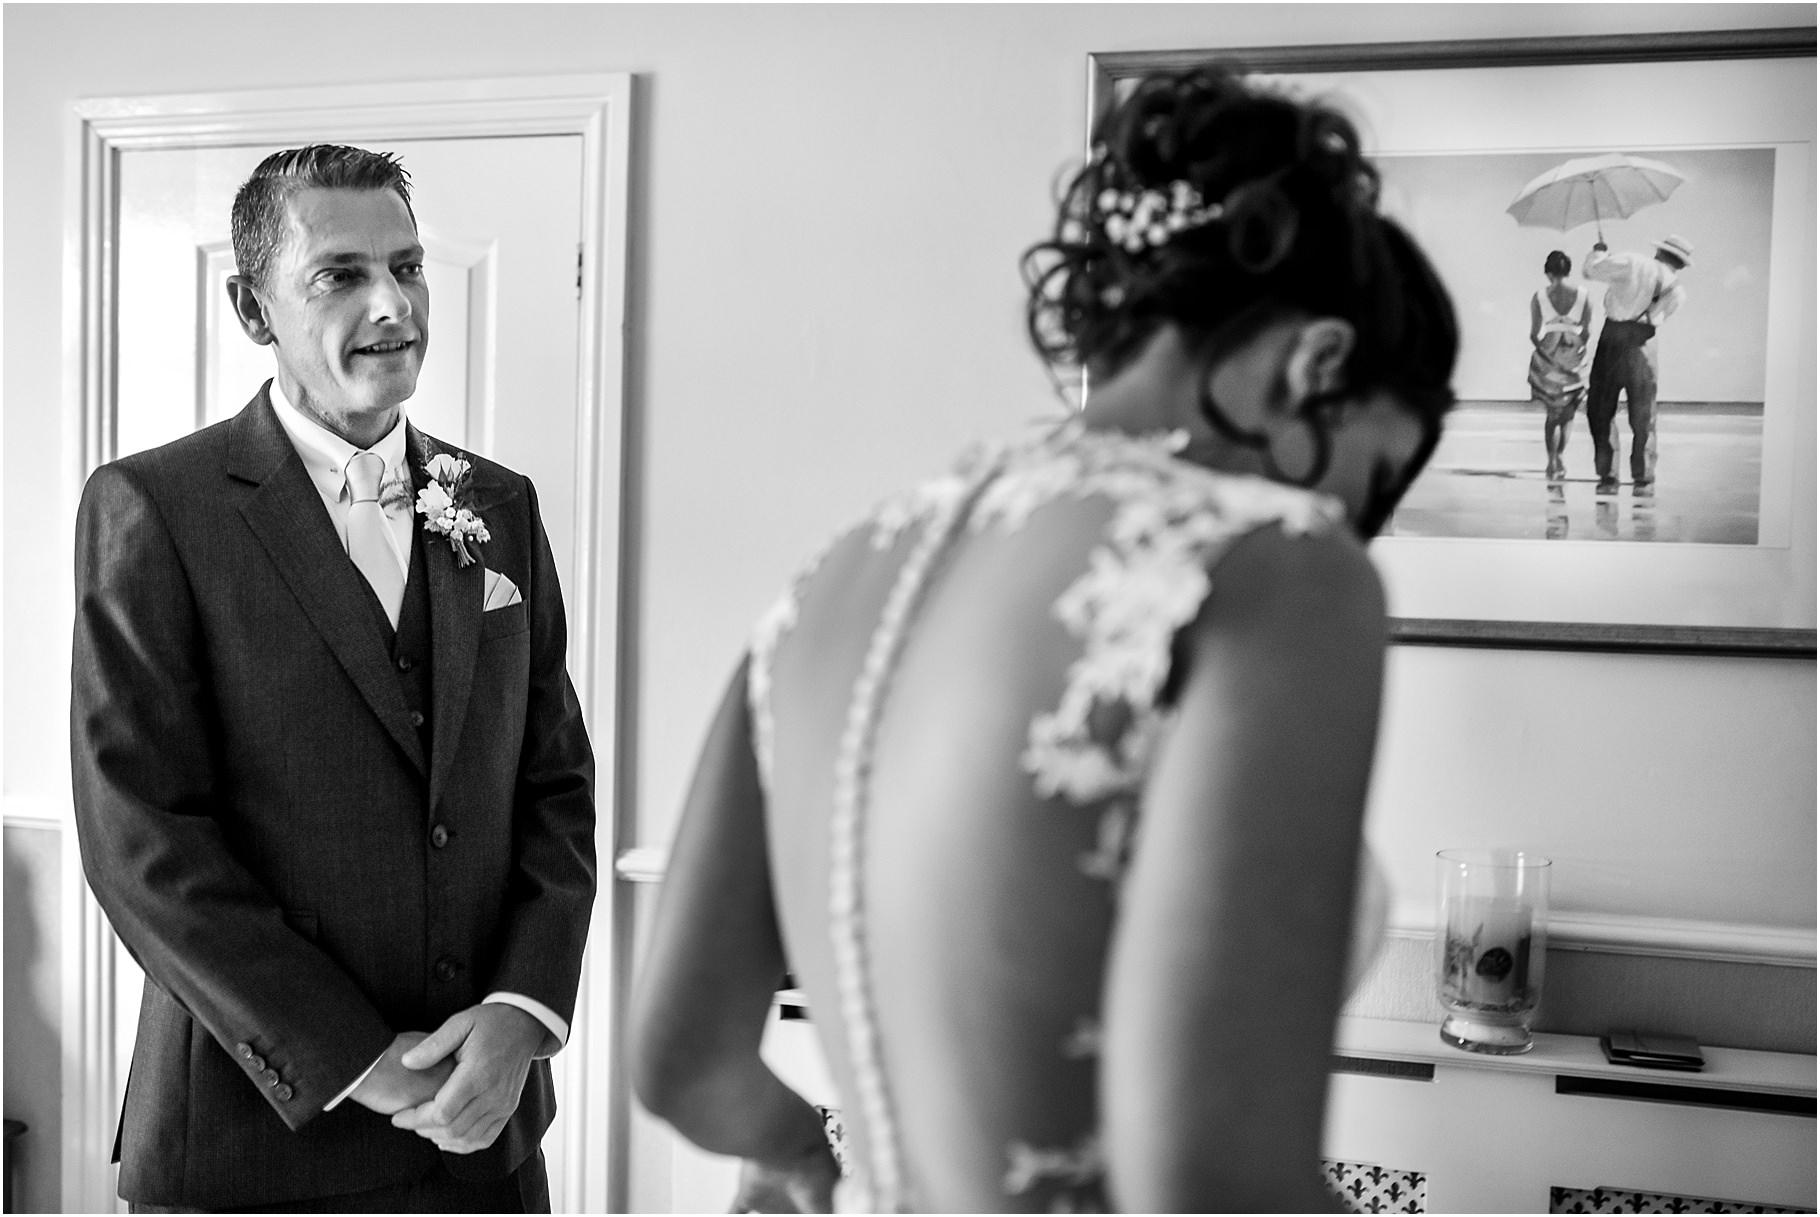 dan-wootton-photography-2017-weddings-132.jpg